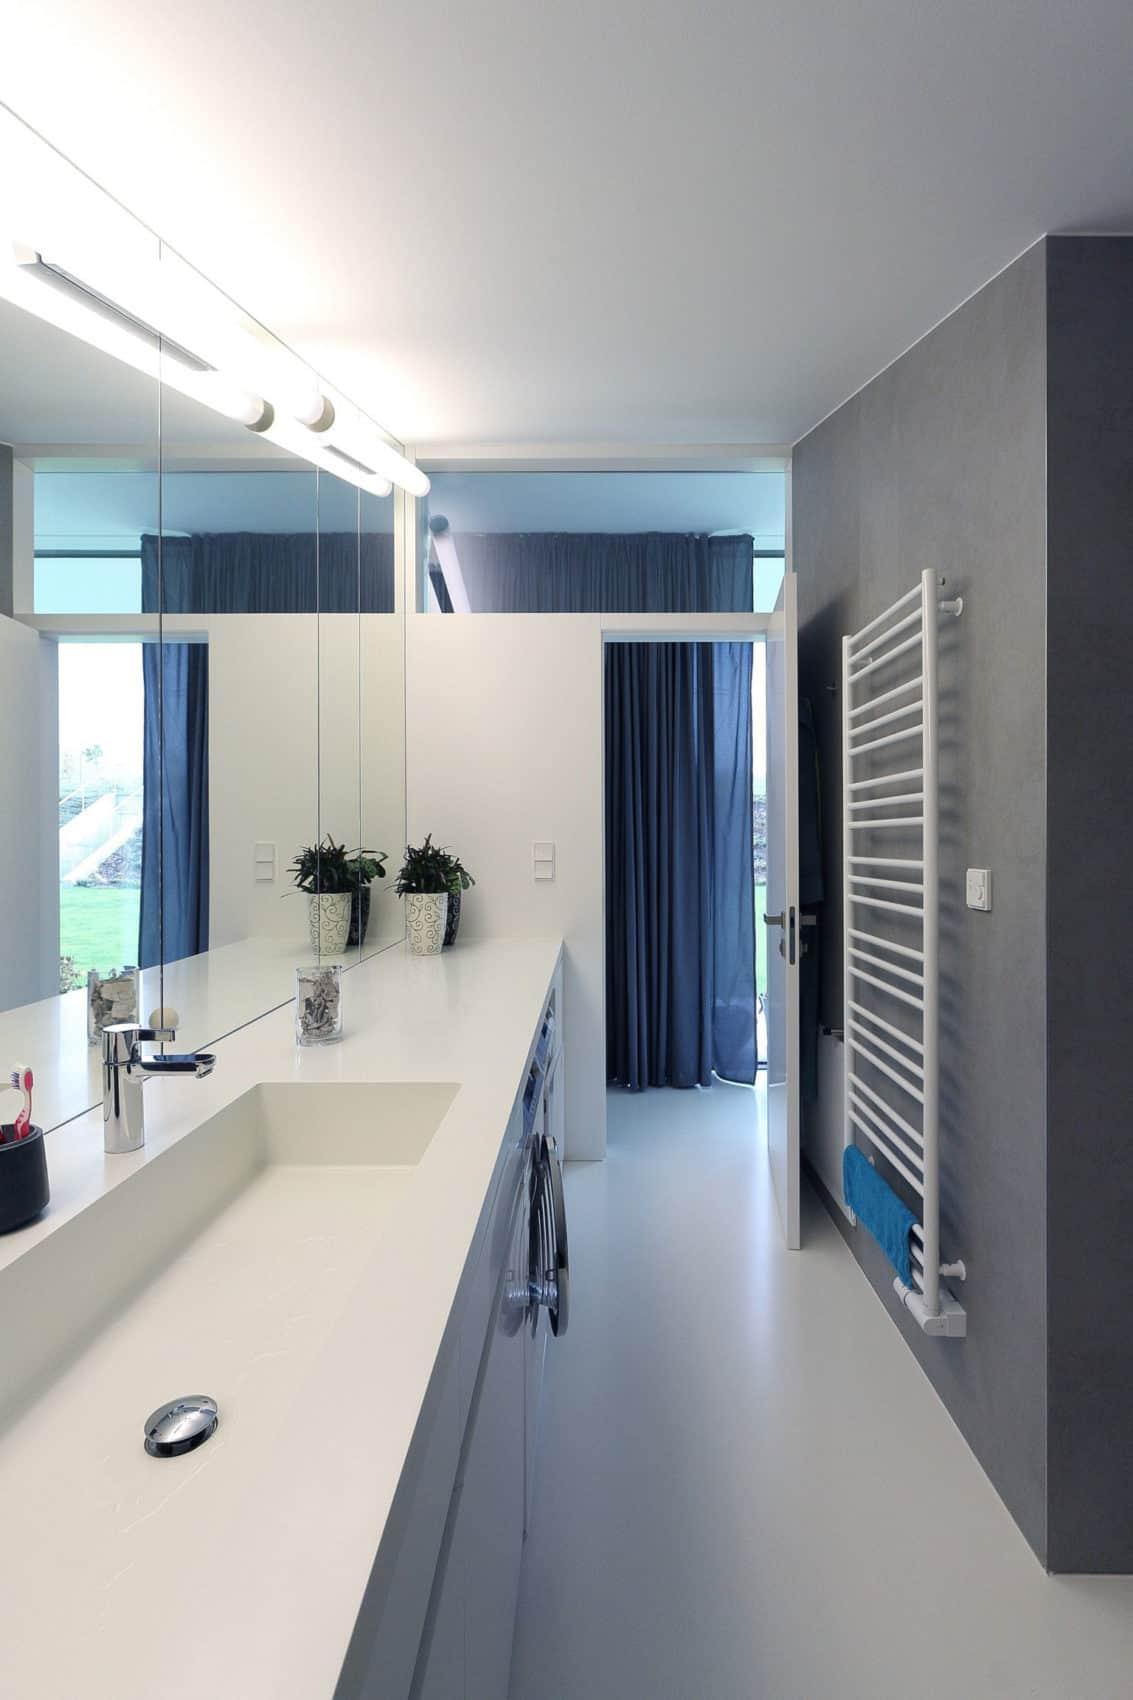 House K2 by Pauliny Hovorka Architekti (18)